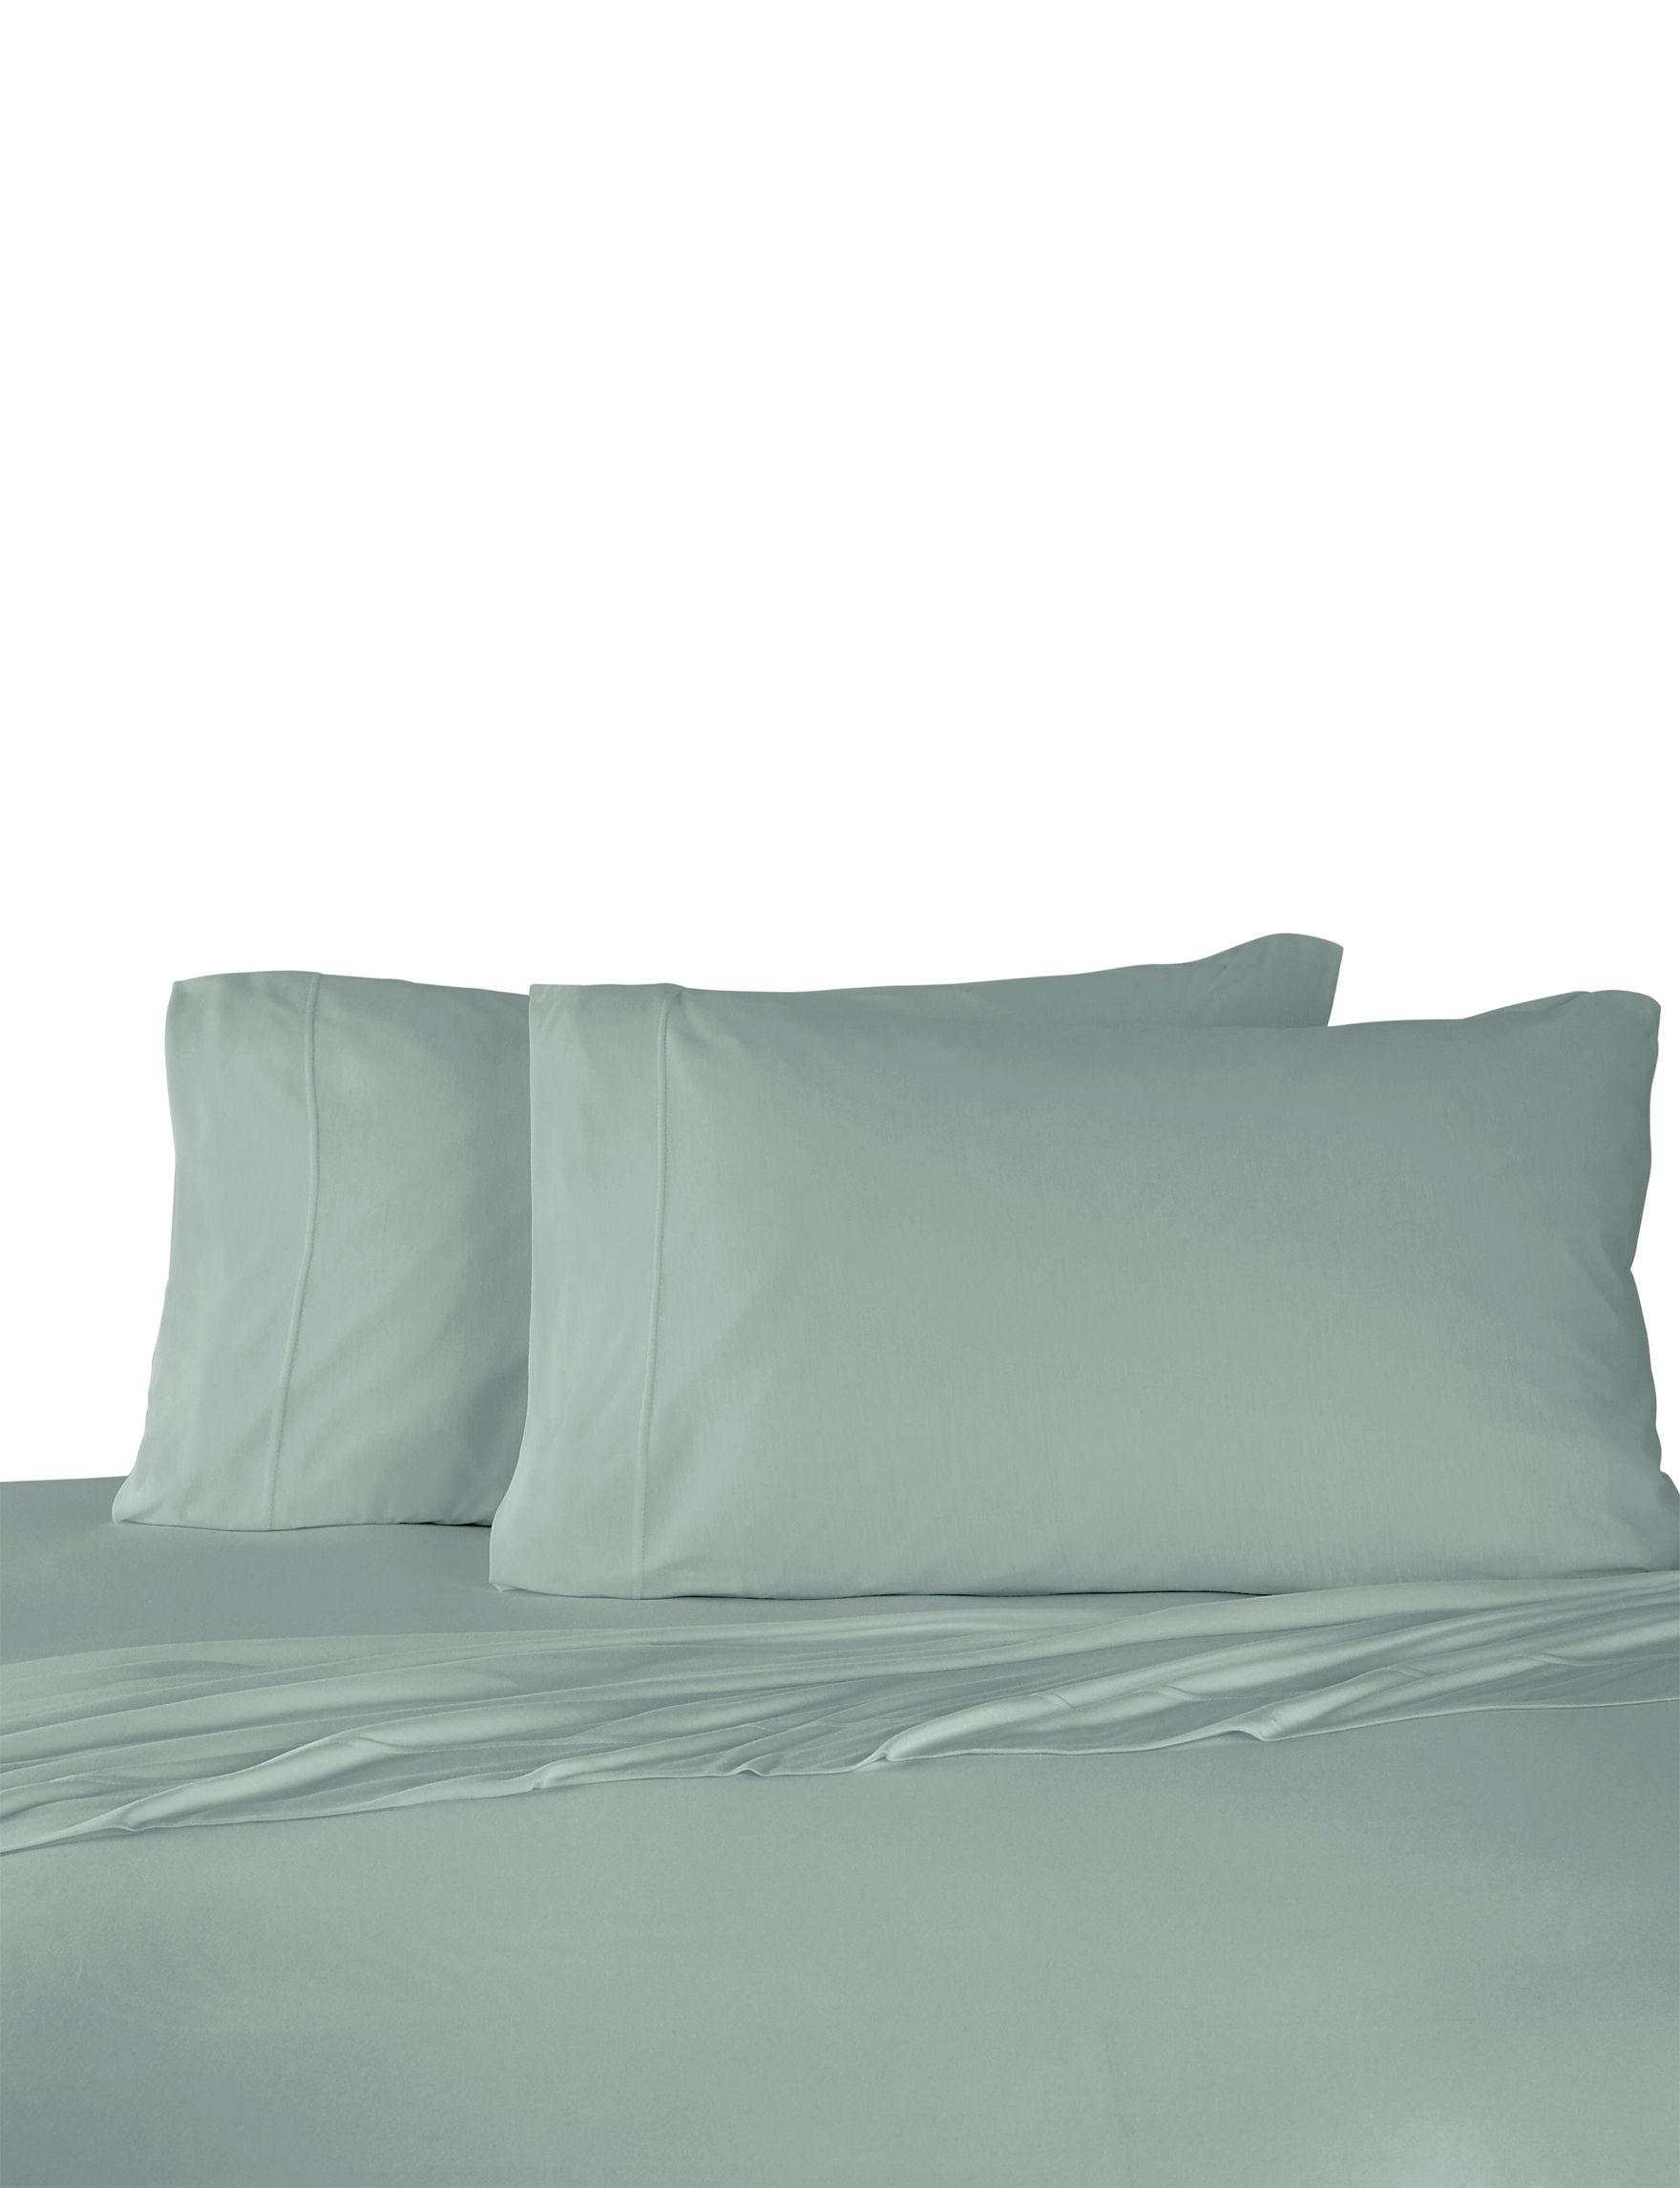 Martex Green Sheets & Pillowcases